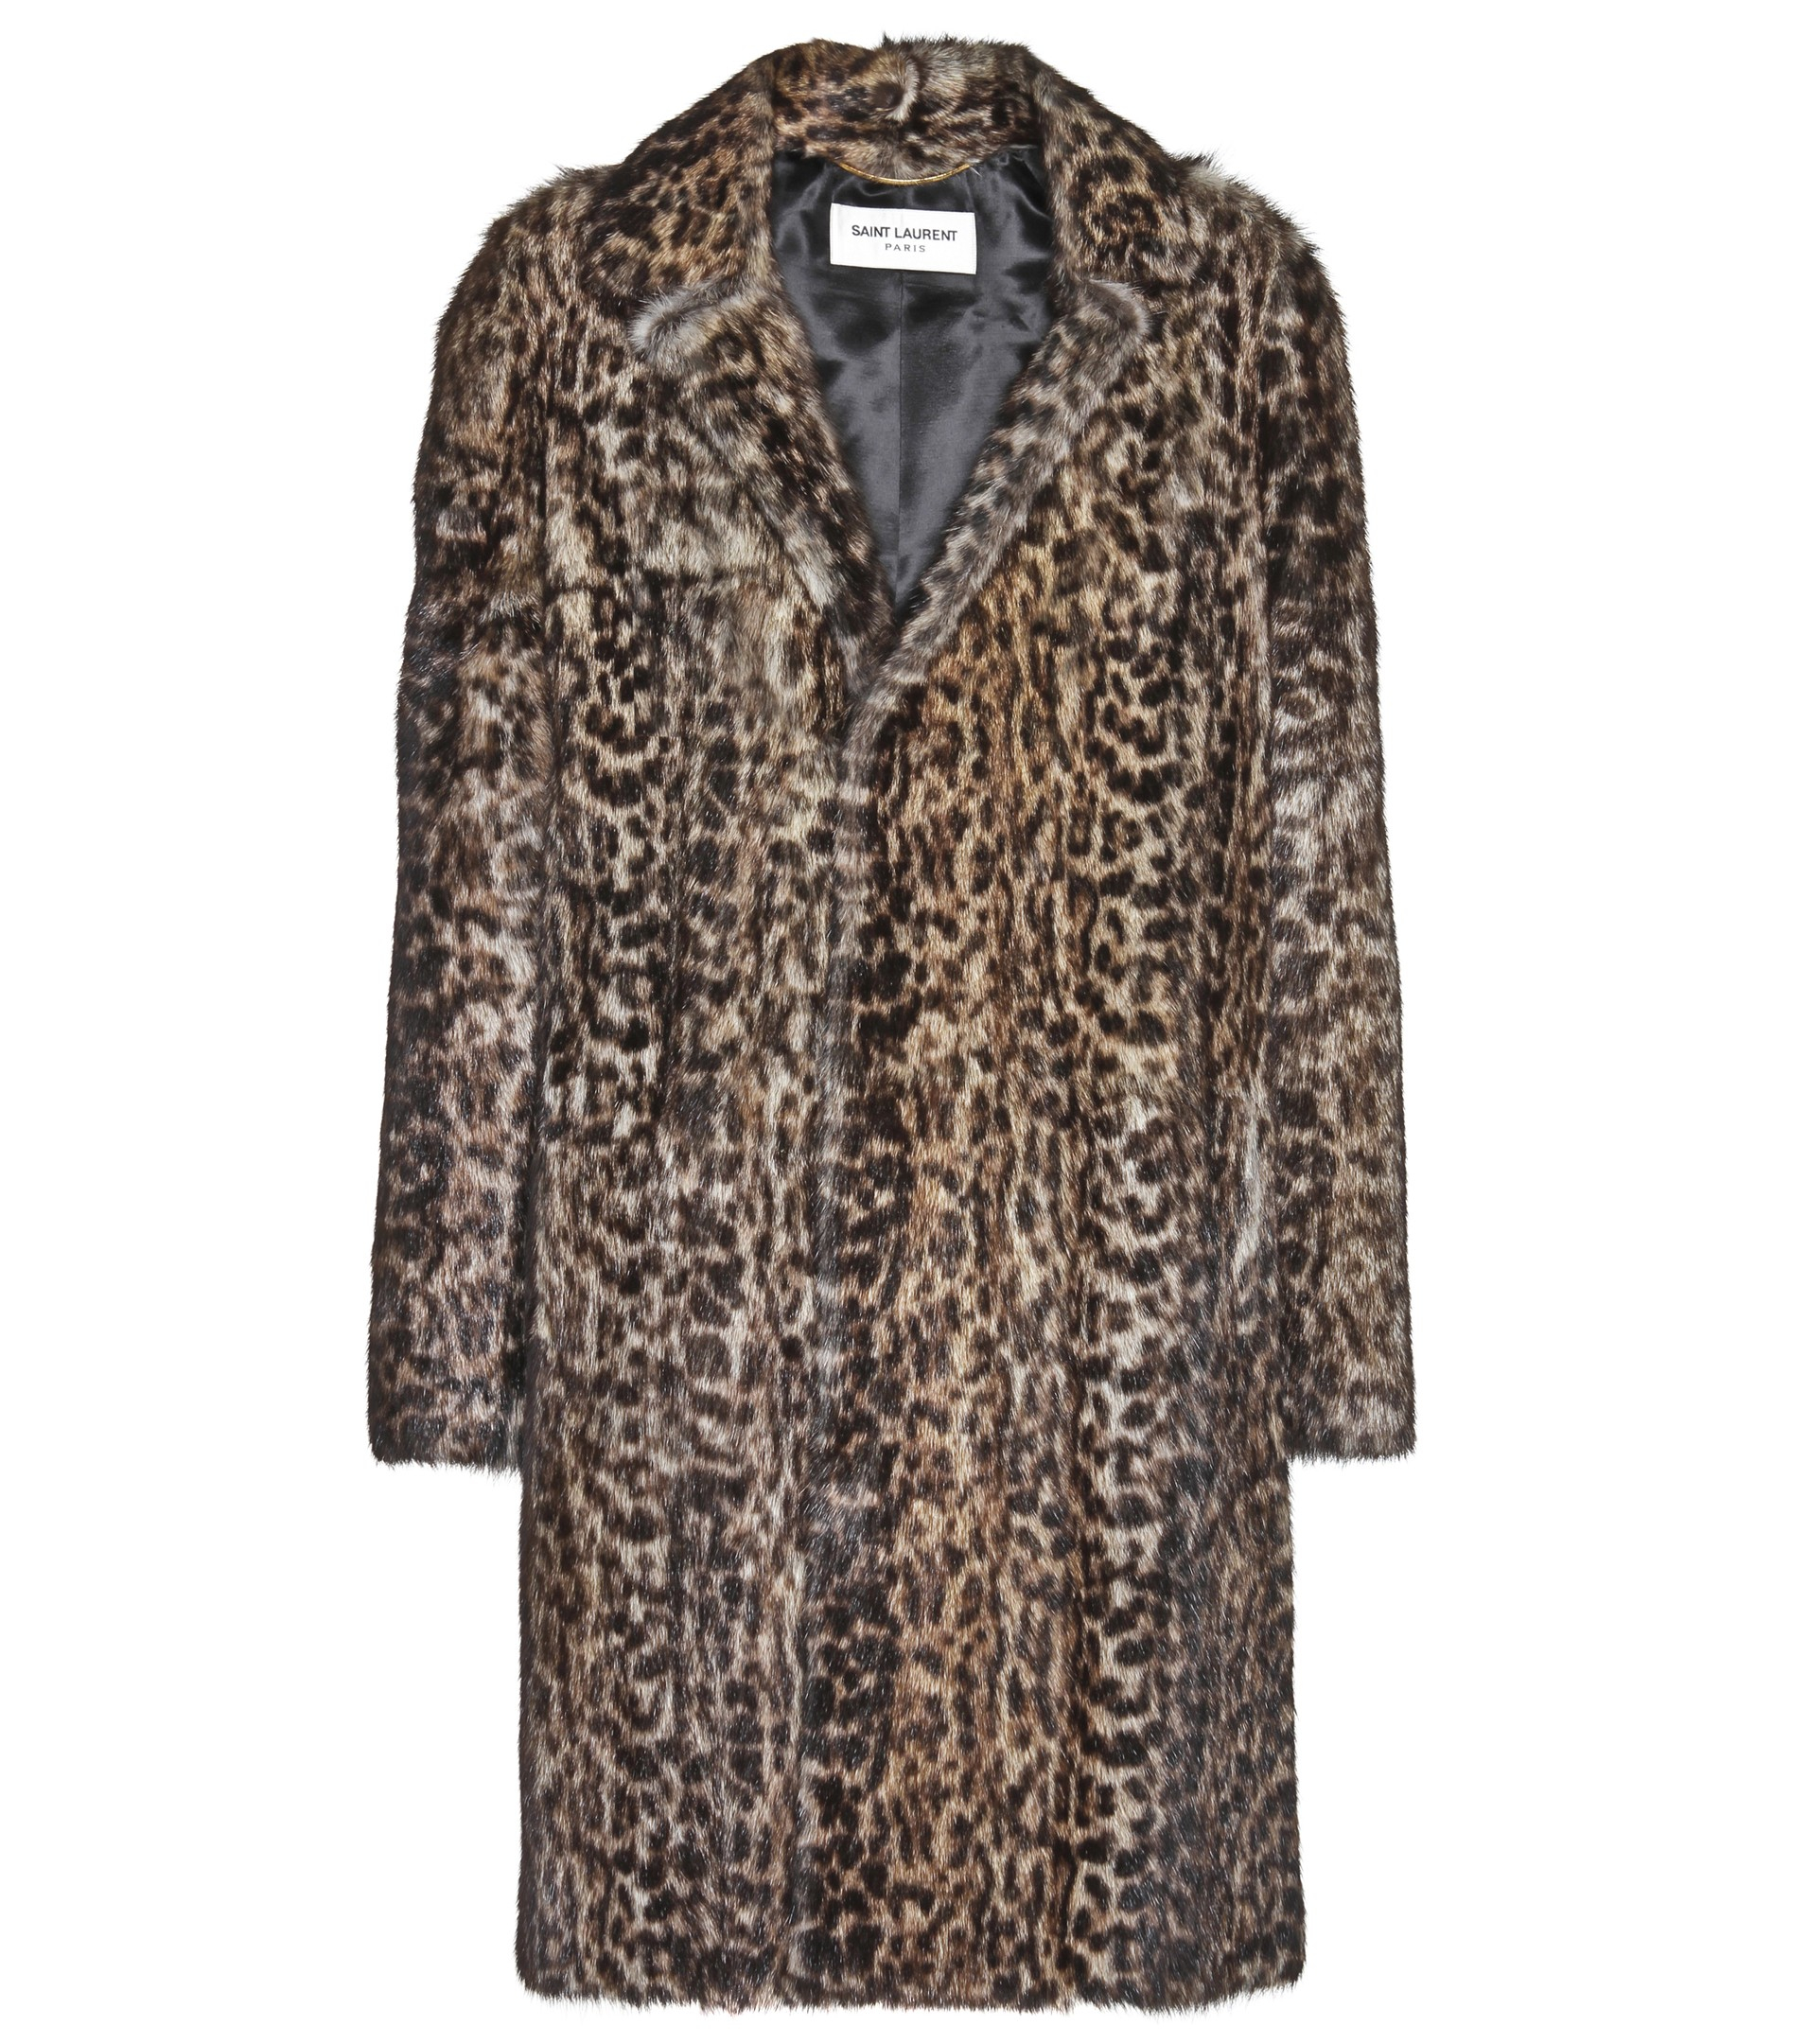 6646e6f836b1 Lyst - Saint Laurent Leopard-print Marmot Fur Coat